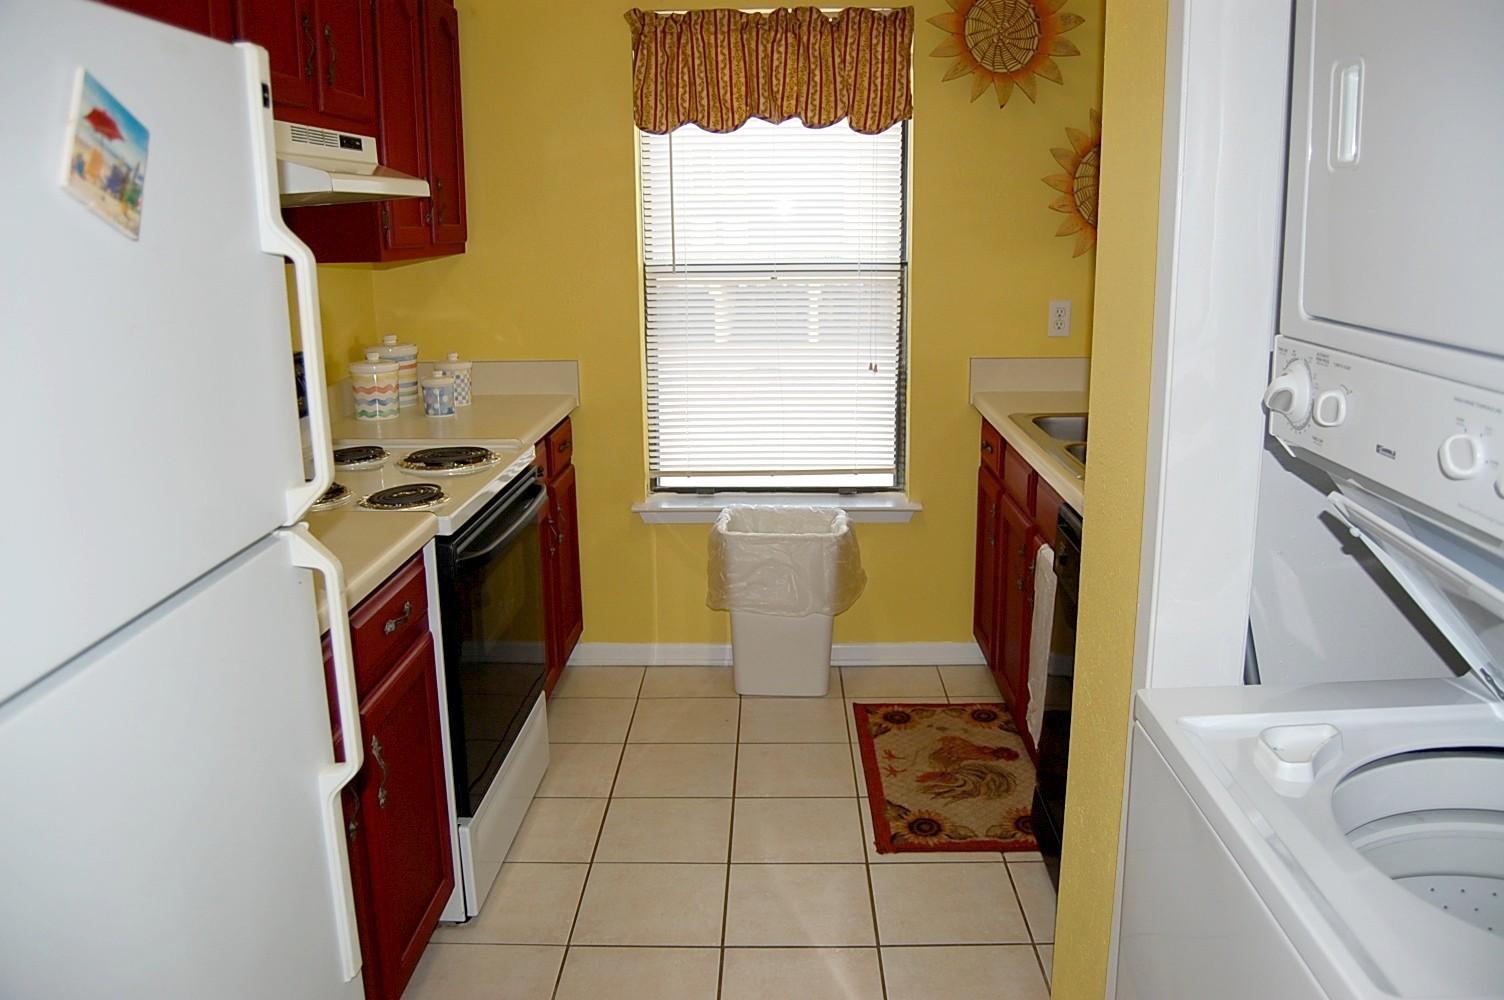 SPYGLASS 101-A Condo rental in Spyglass - Gulf Shores in Gulf Shores Alabama - #12